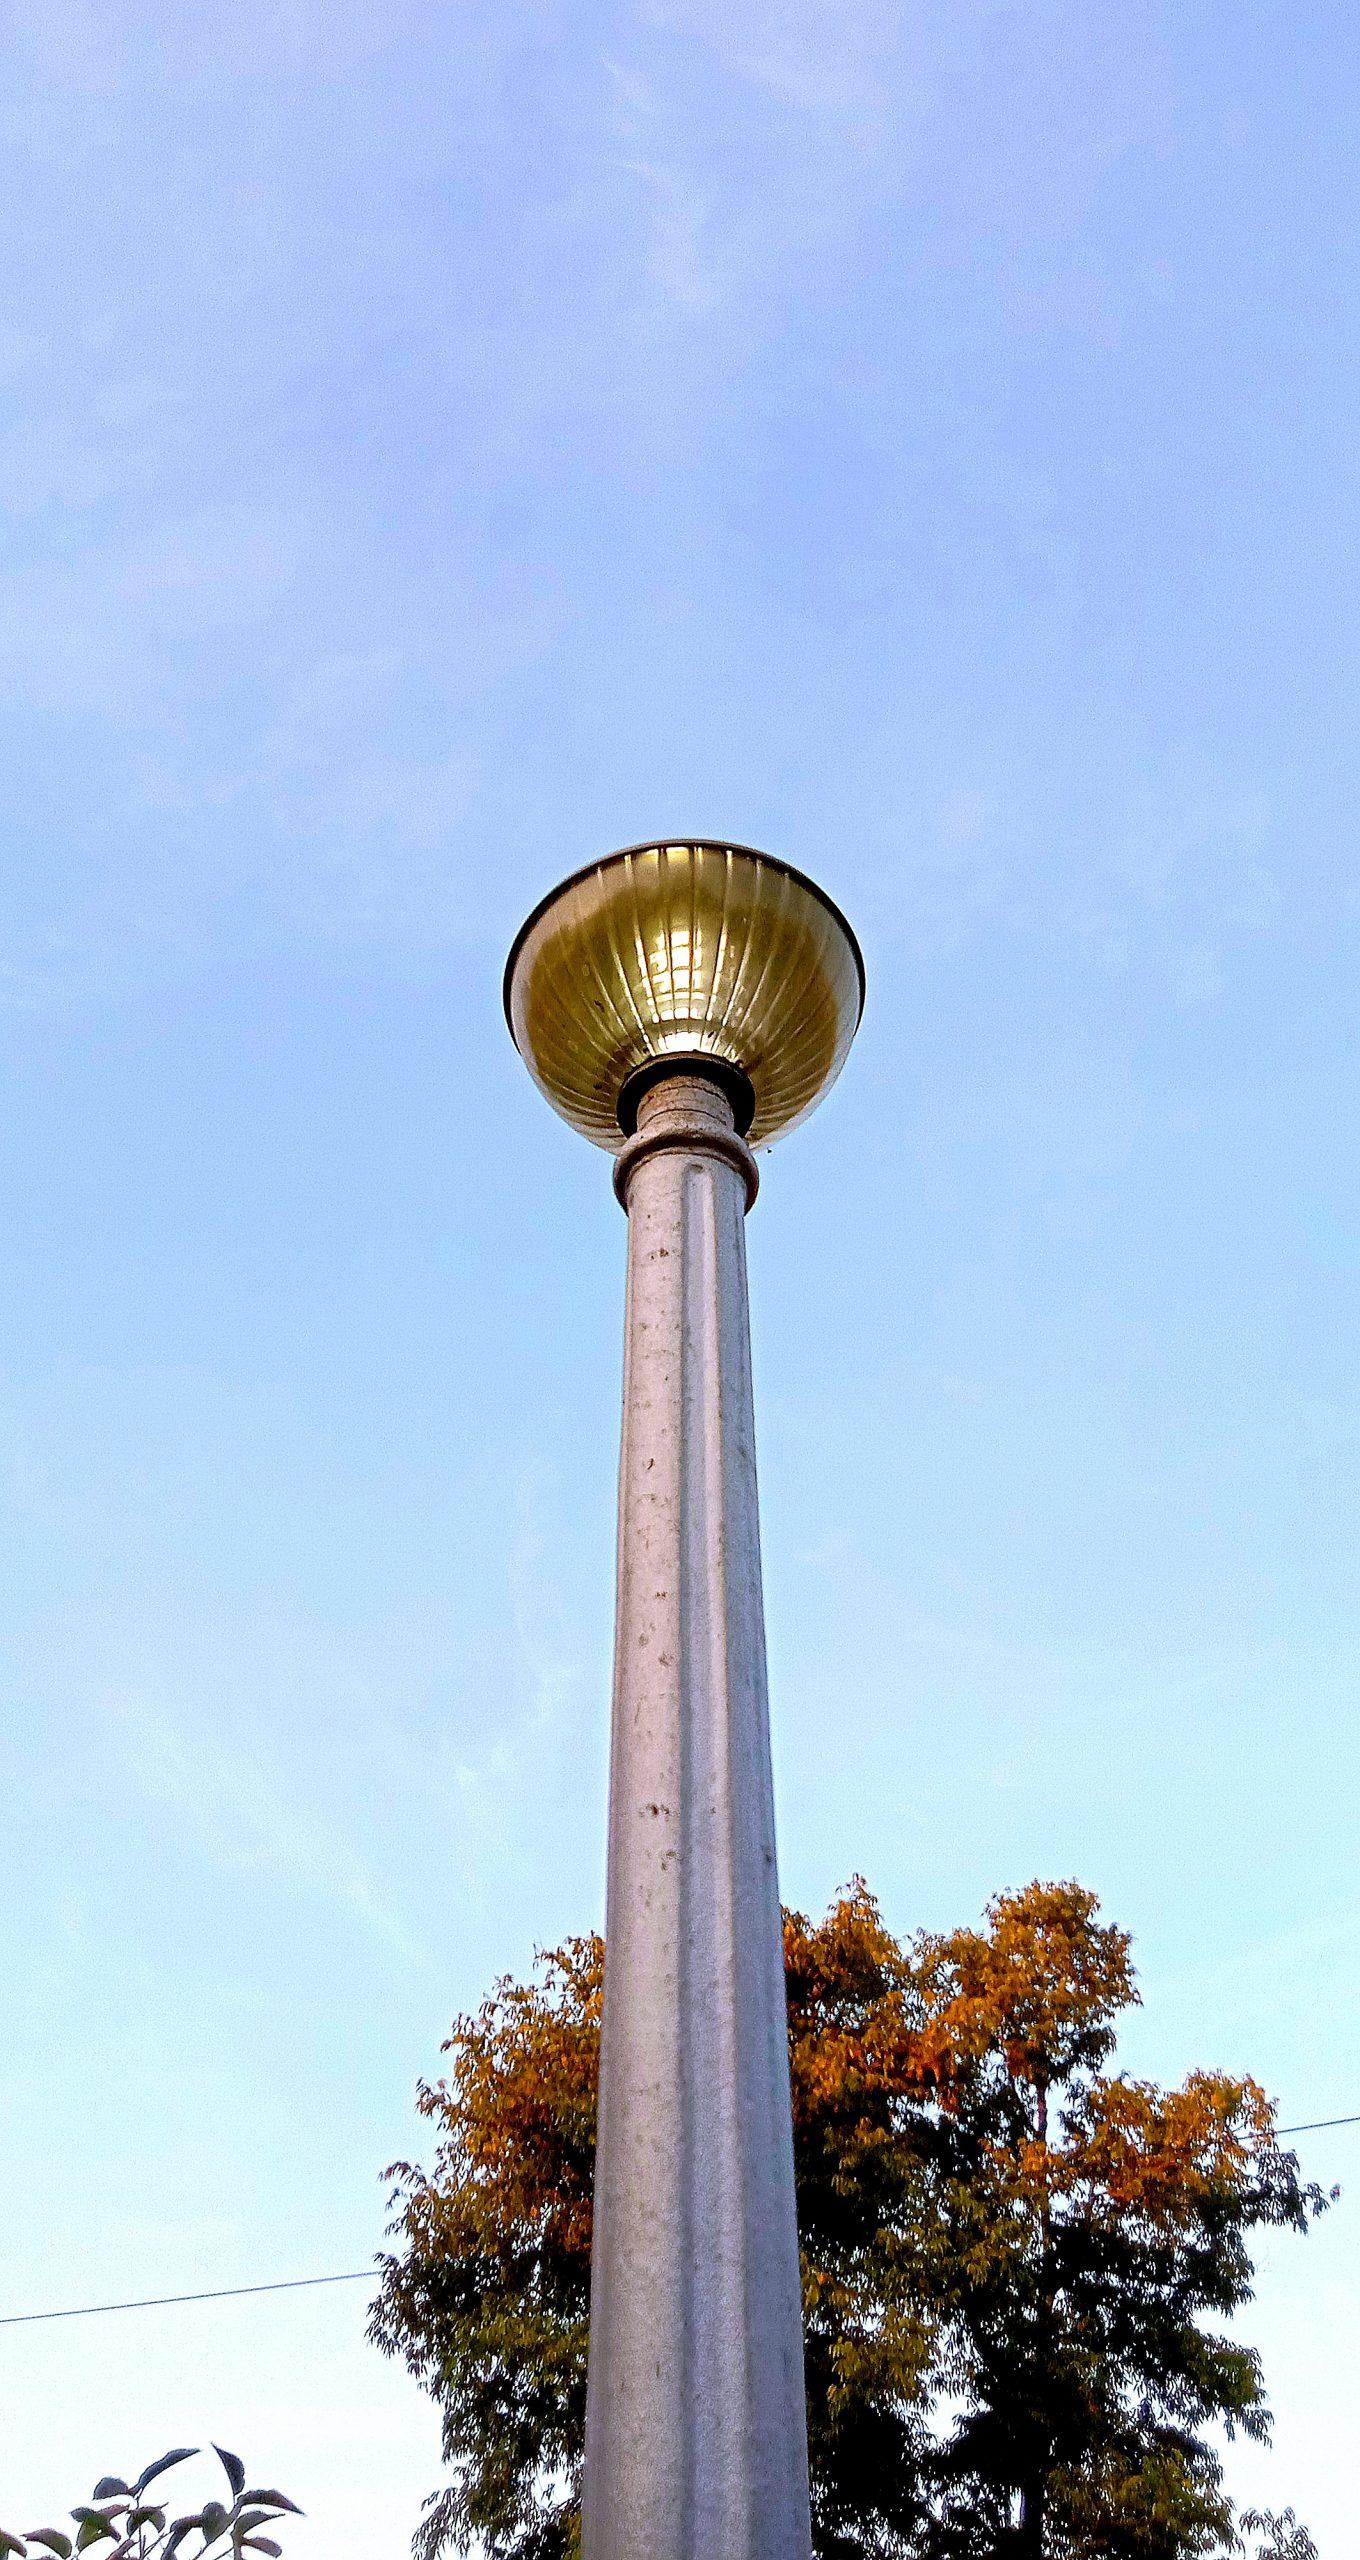 A light pole